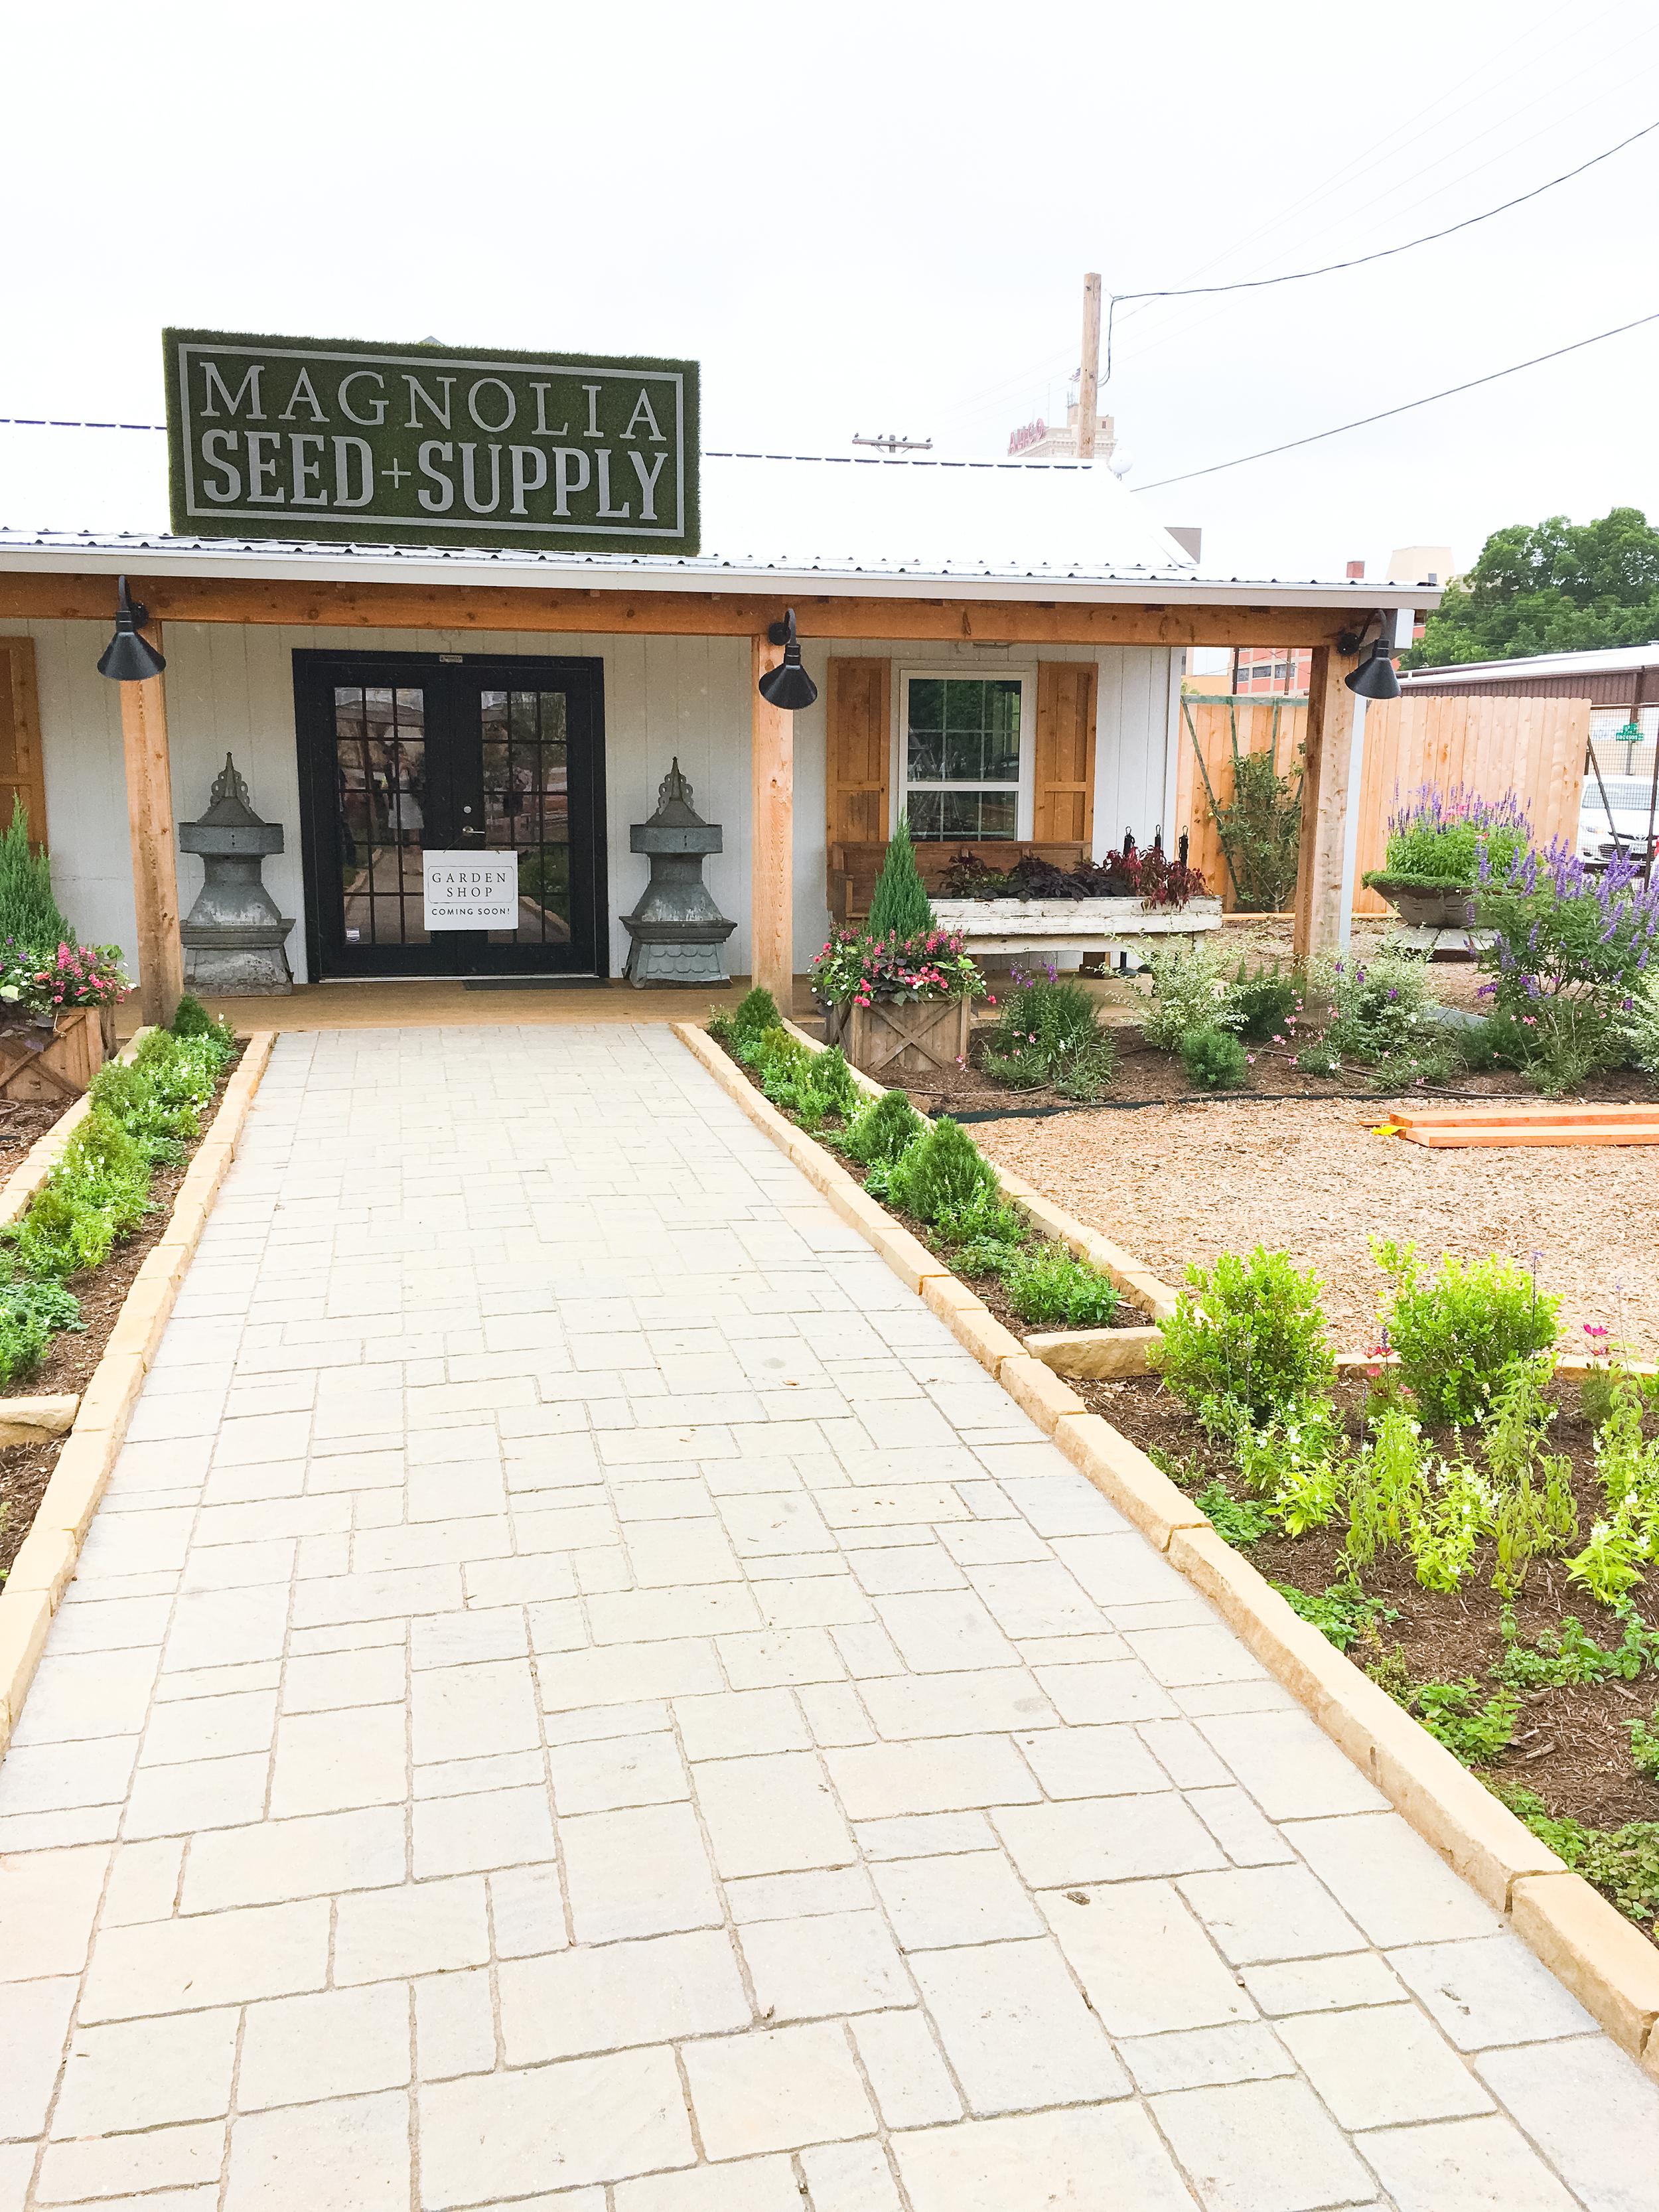 Magnolia Market - Garden Shop - Fixer Upper on HGTV - Brightly & Co